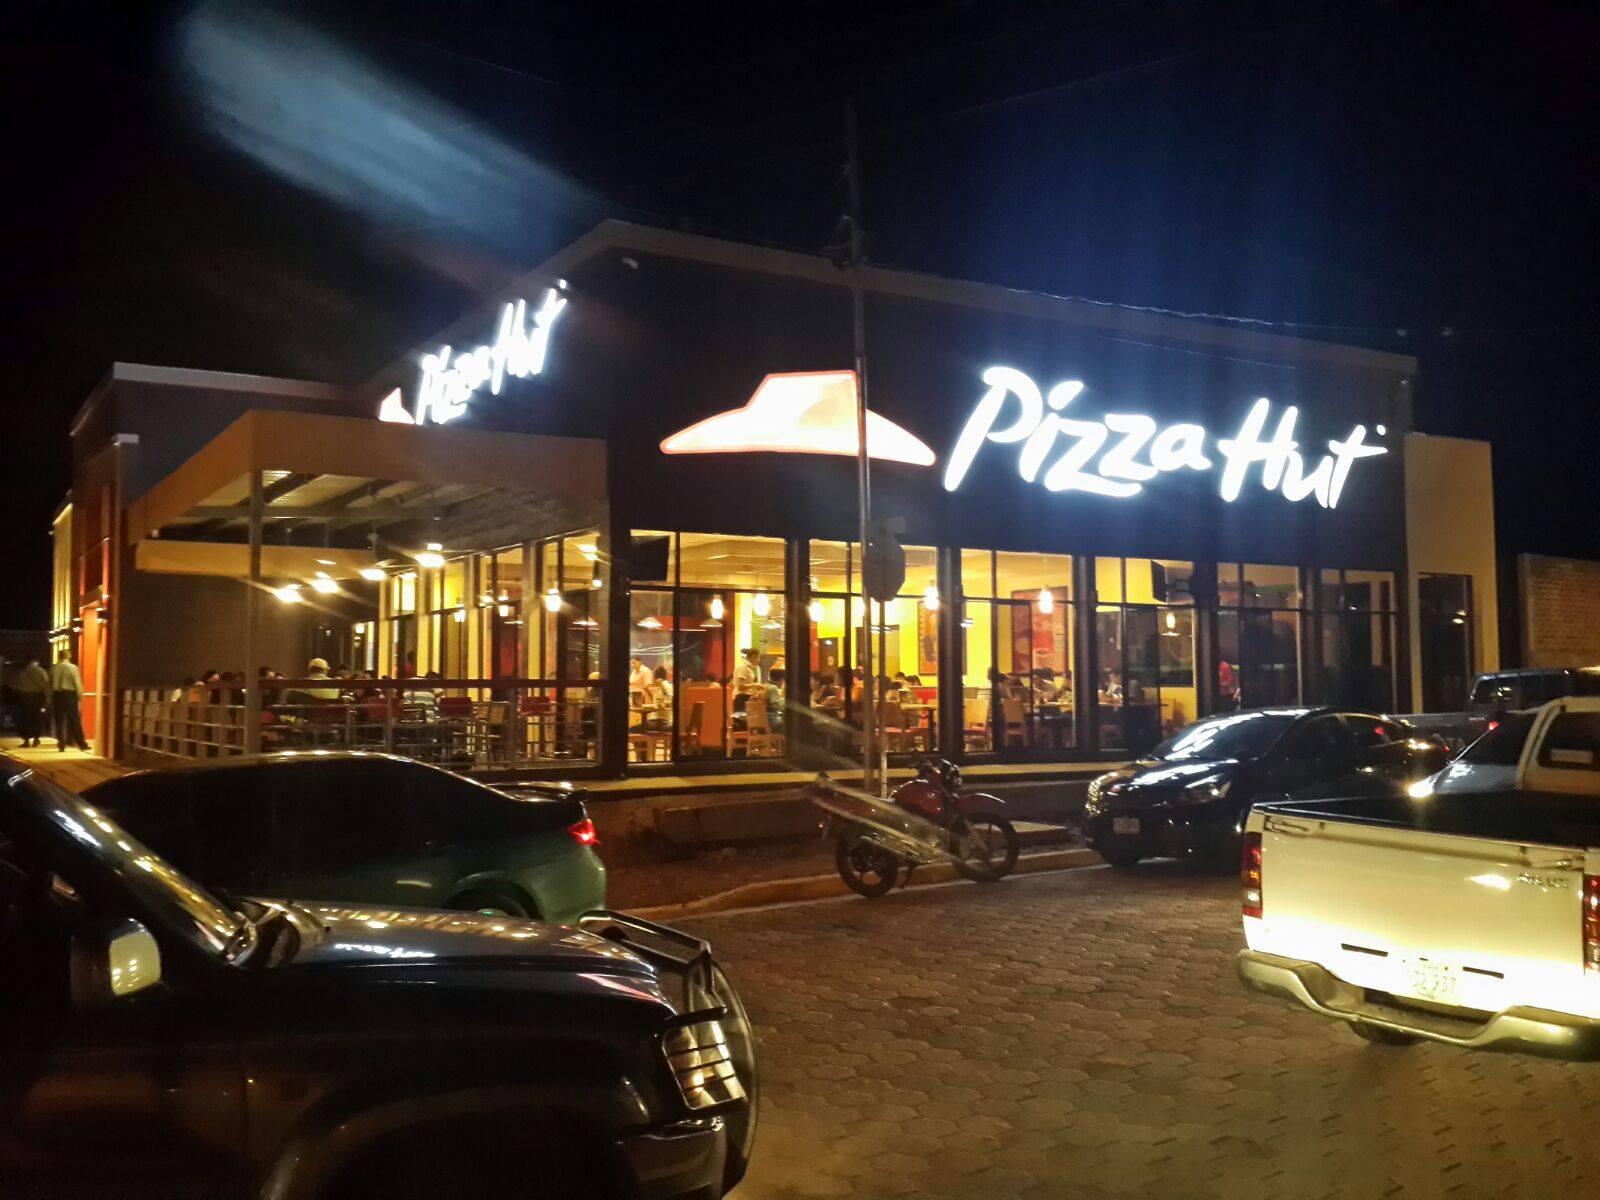 Pizza hut inaugura nuevo restaurante en estel rvn - Restaurante pizza hut ...